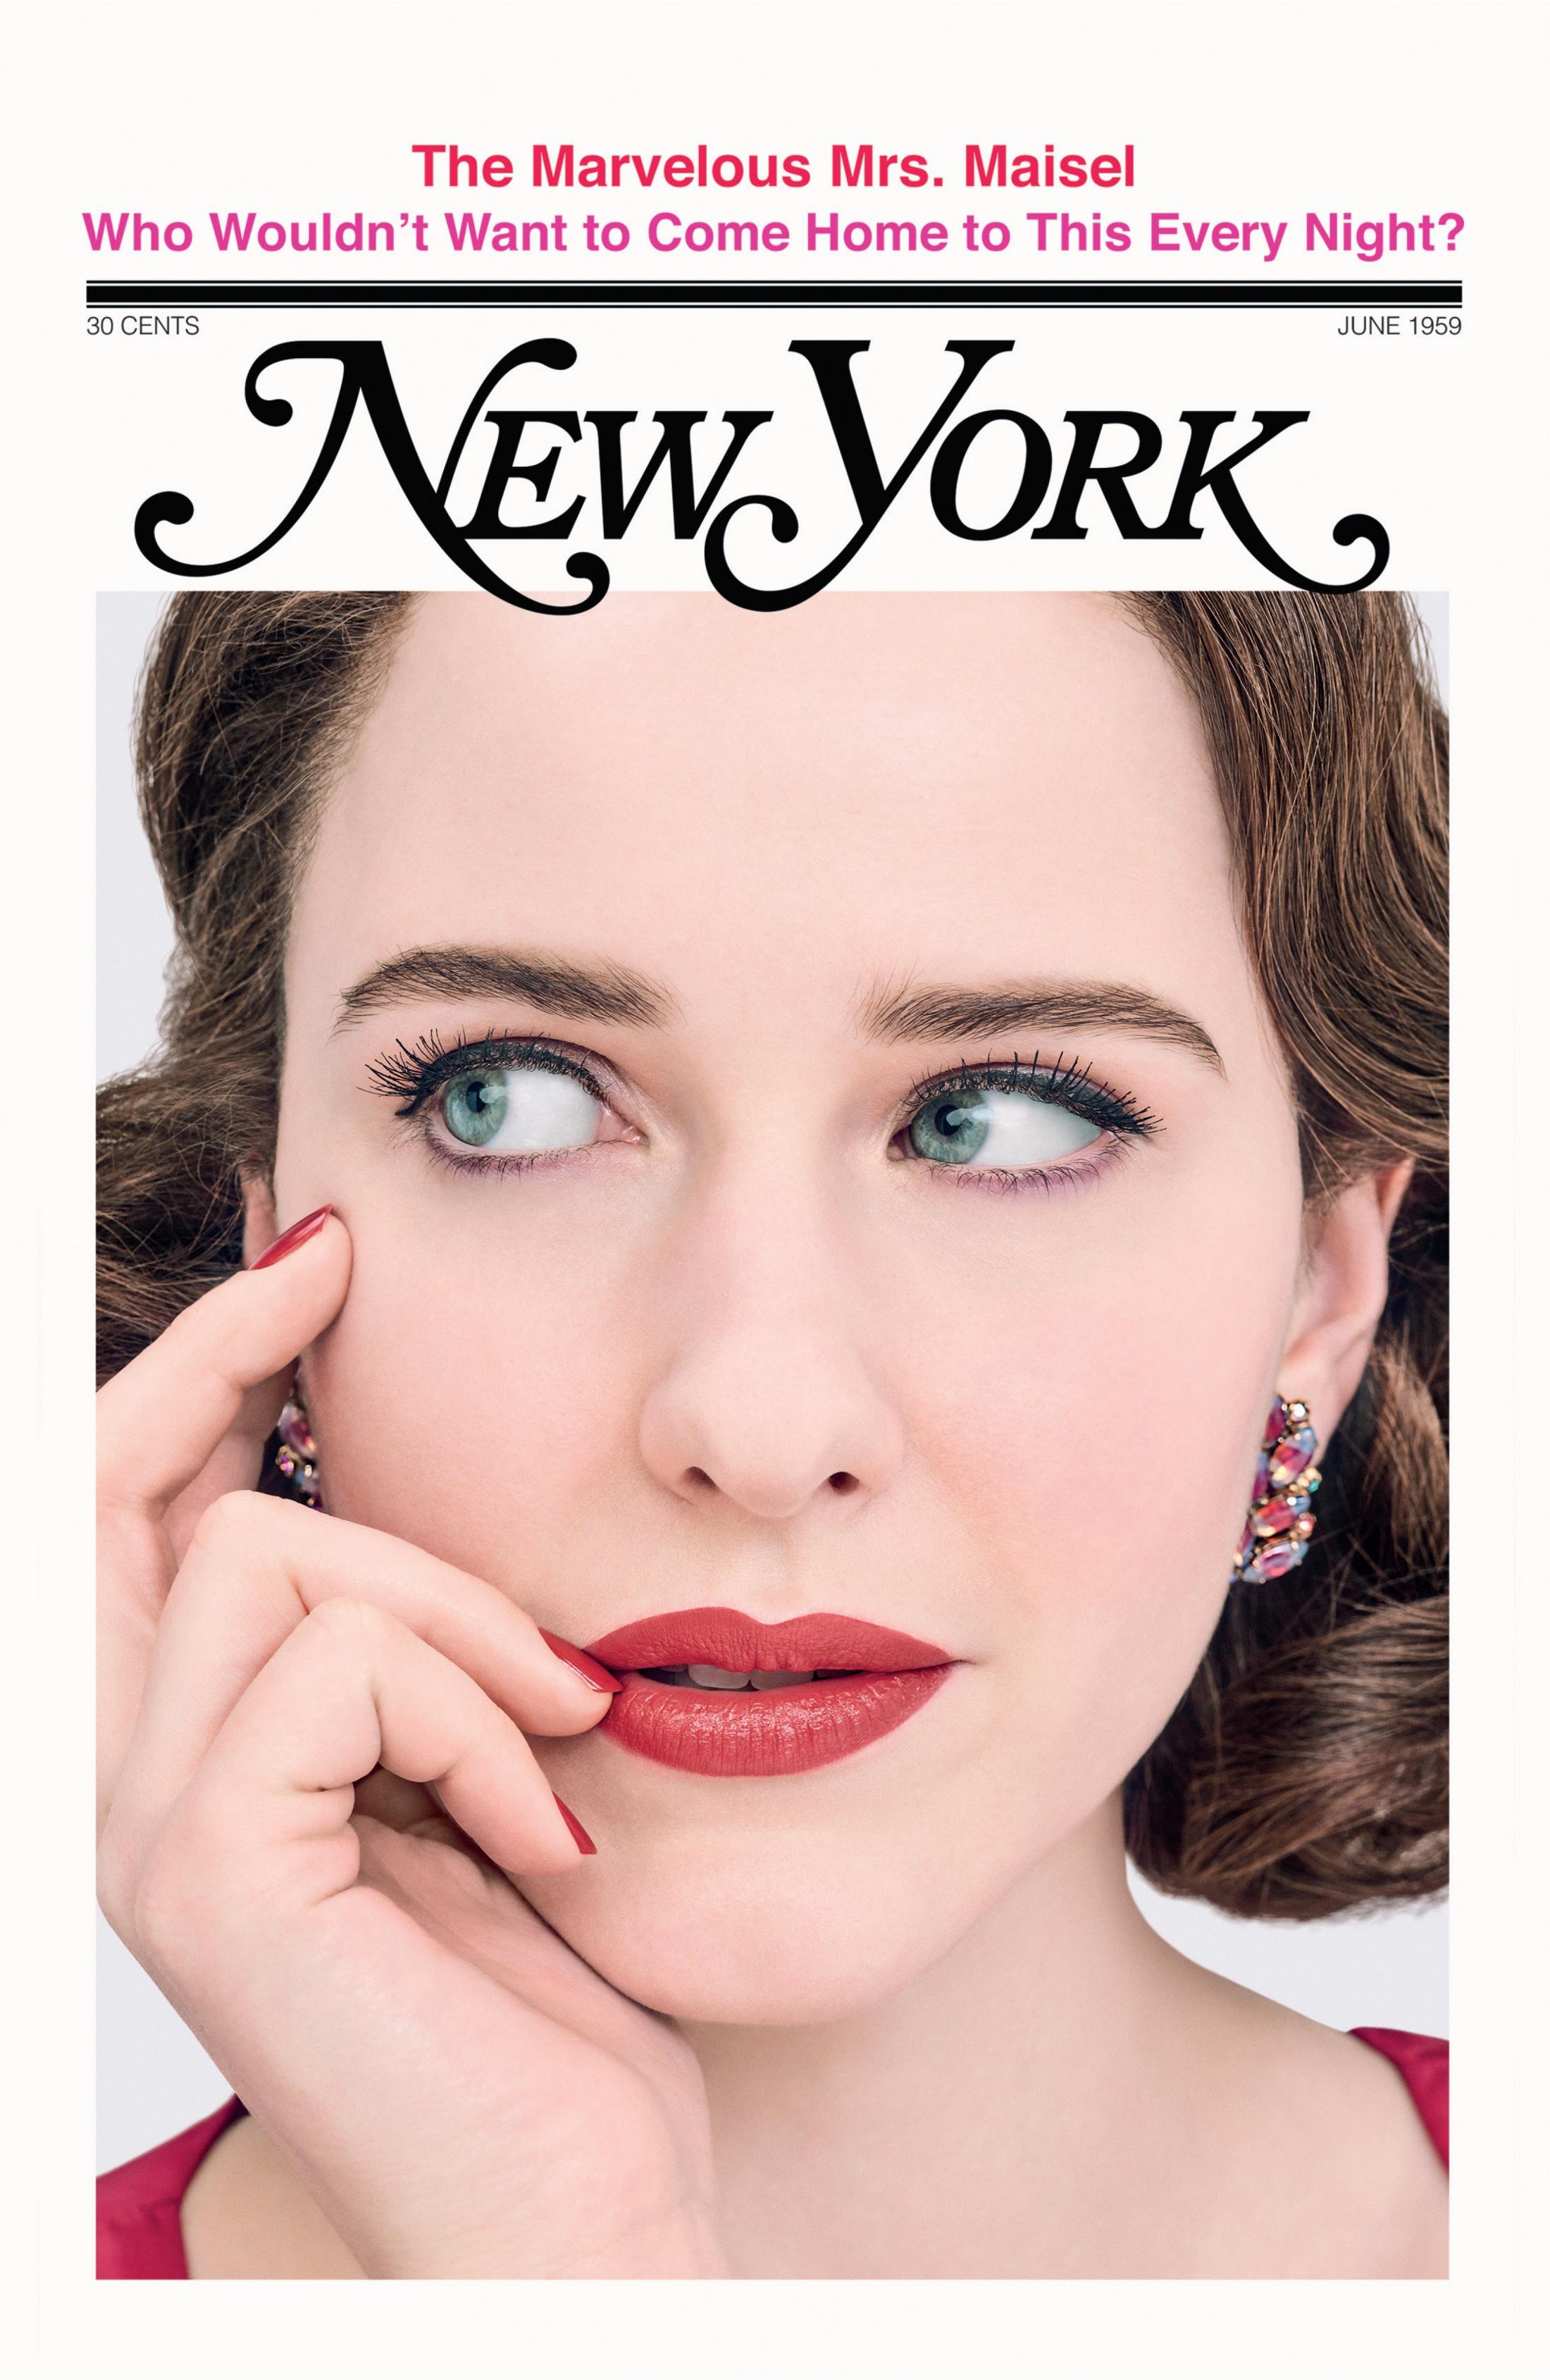 Thumbnail for The Marvelous Mrs. Maisel Magazine Cover Takeover (New York Magazine)